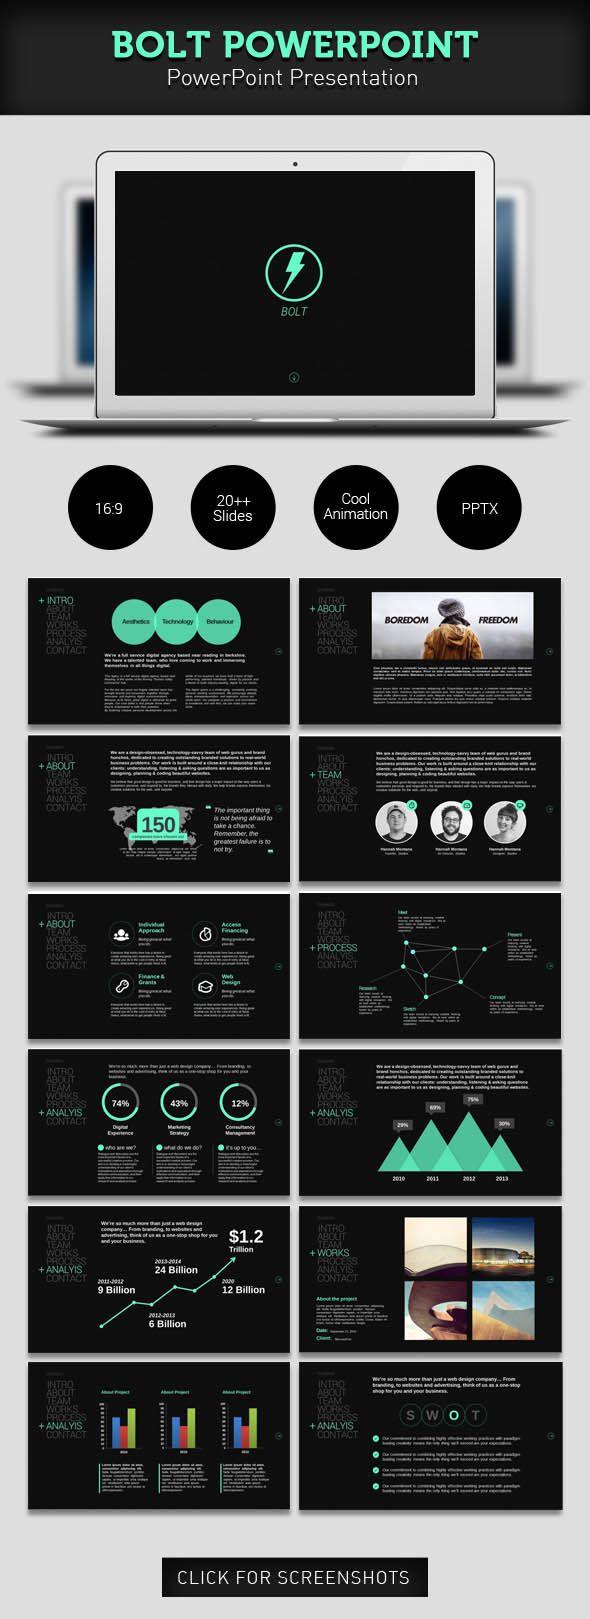 701 best powerpoint template images on pinterest | script fonts, Modern powerpoint